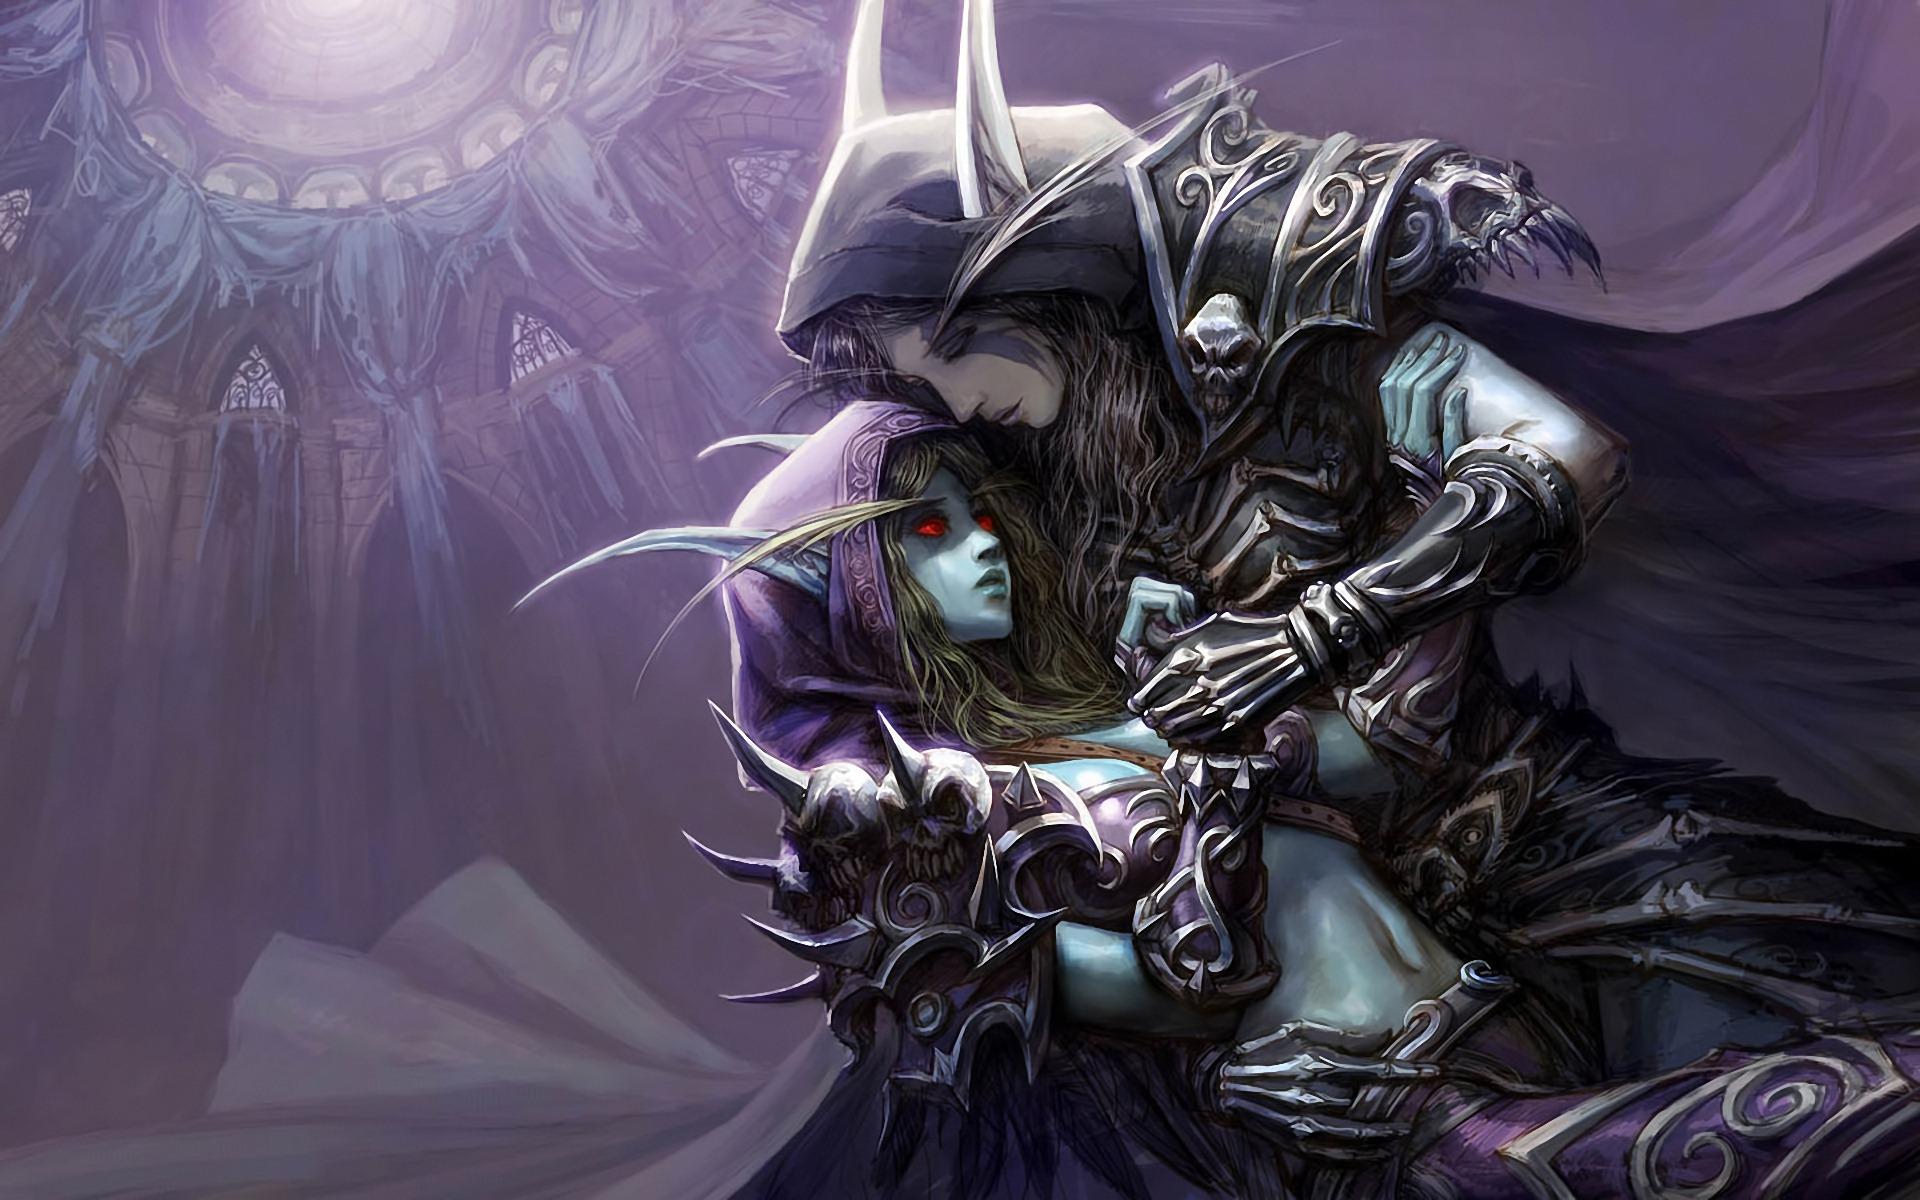 Warcraft Dark Lady Elf Wallpaper High Definition HD Games Wallpaper 1920x1200